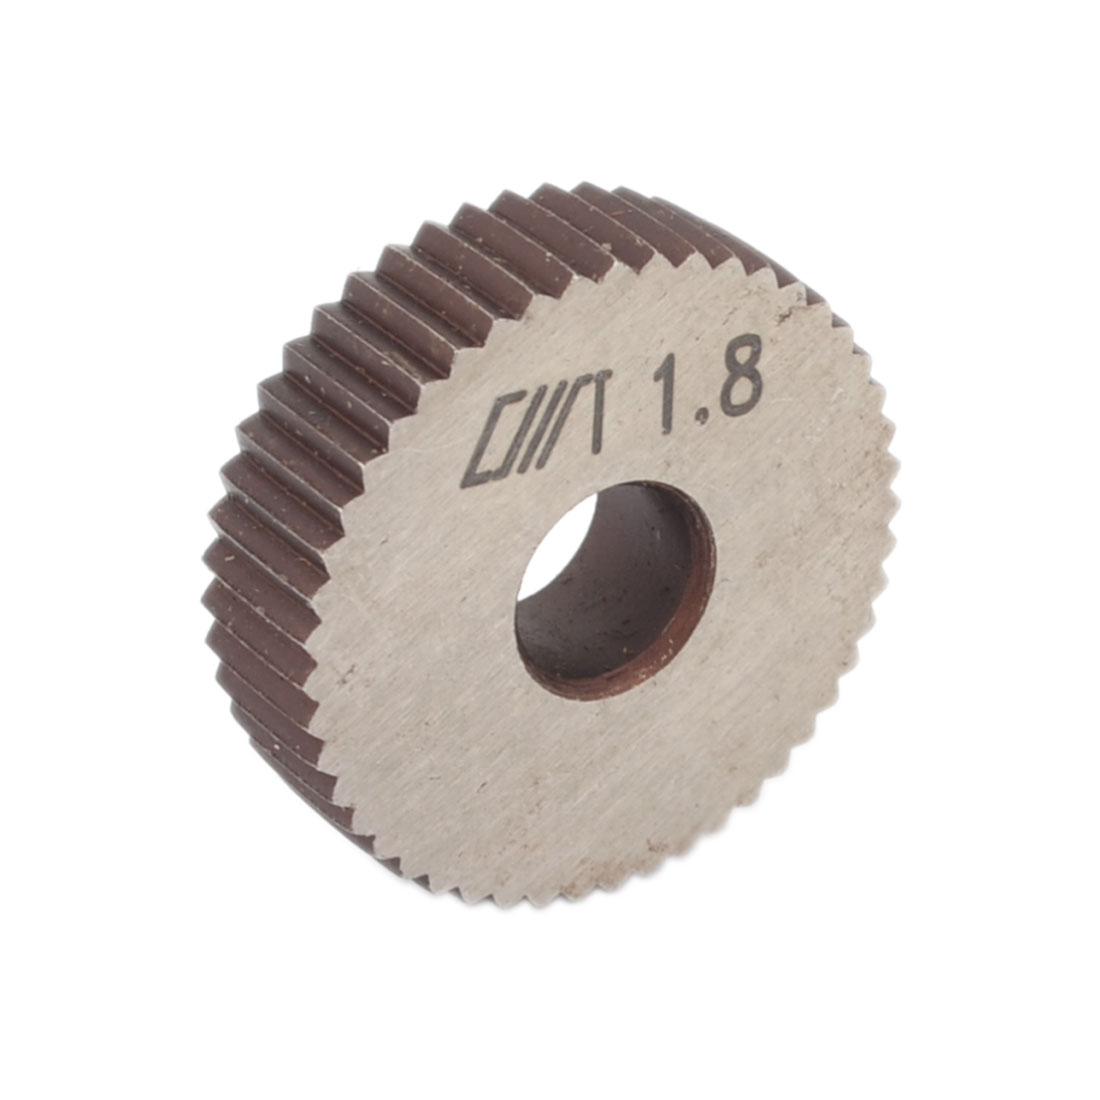 Single Straight Coarse 1.8mm Pitch Linear Knurl Wheel Knurling Tool